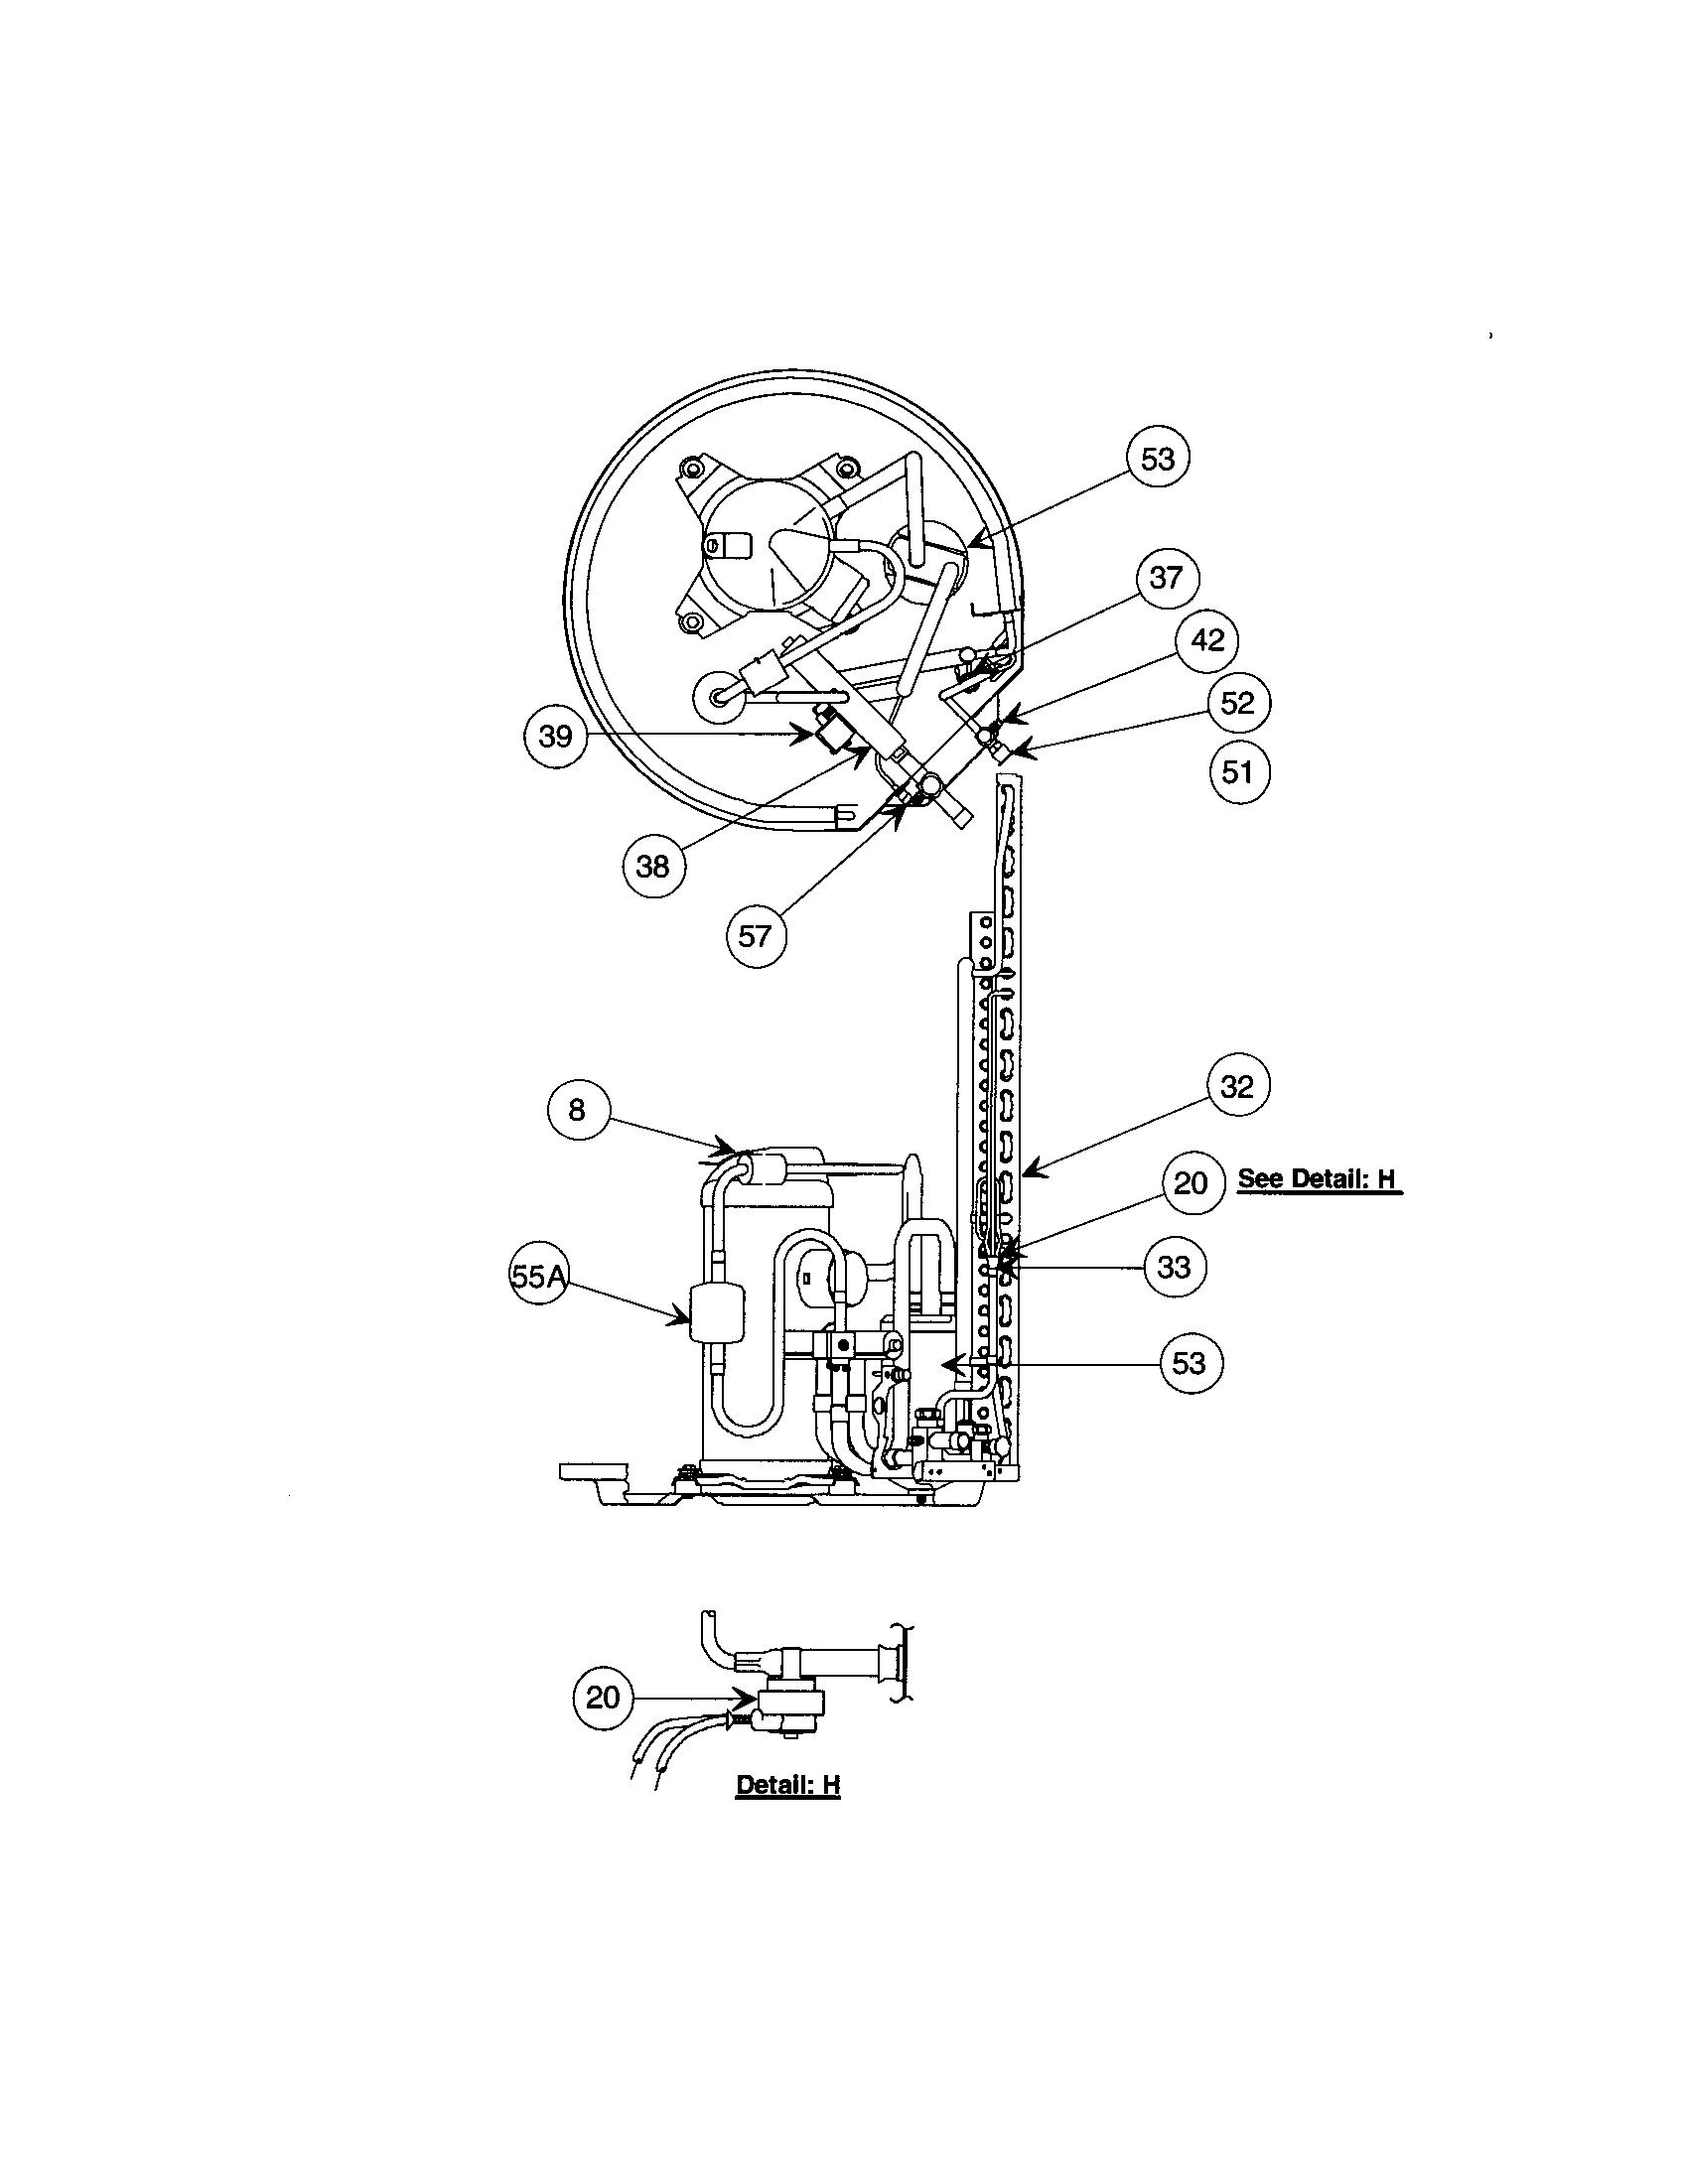 2011 subaru forester engine diagram imageresizertool com subaru legacy fuse box location